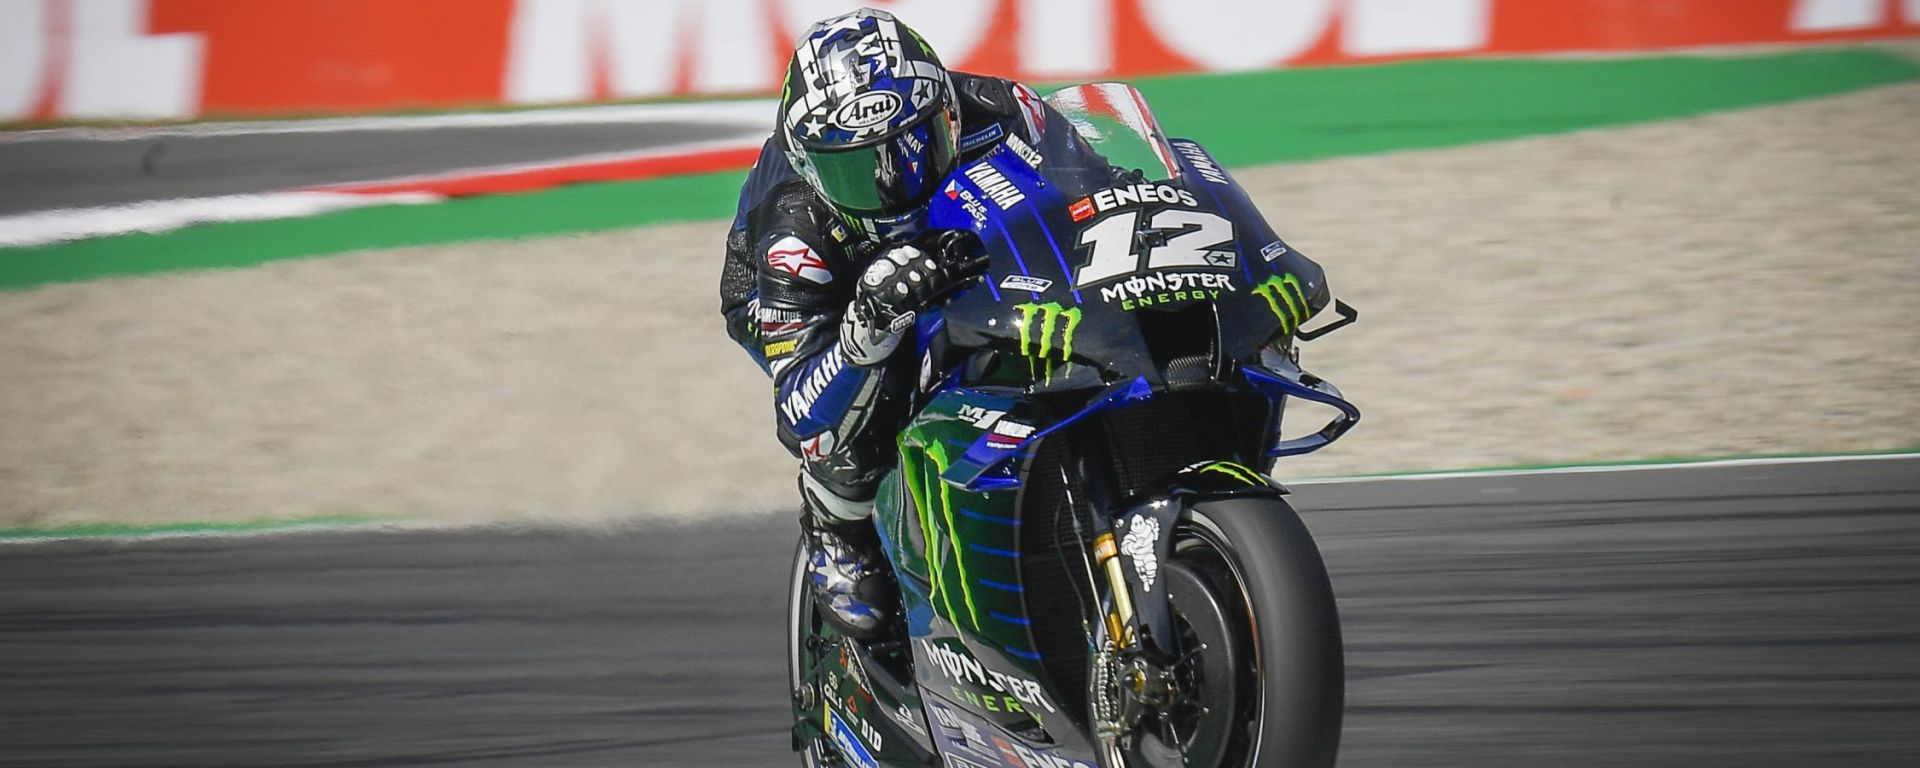 MotoGP Olanda 2021, Assen: Maverick Vinales (Yamaha)